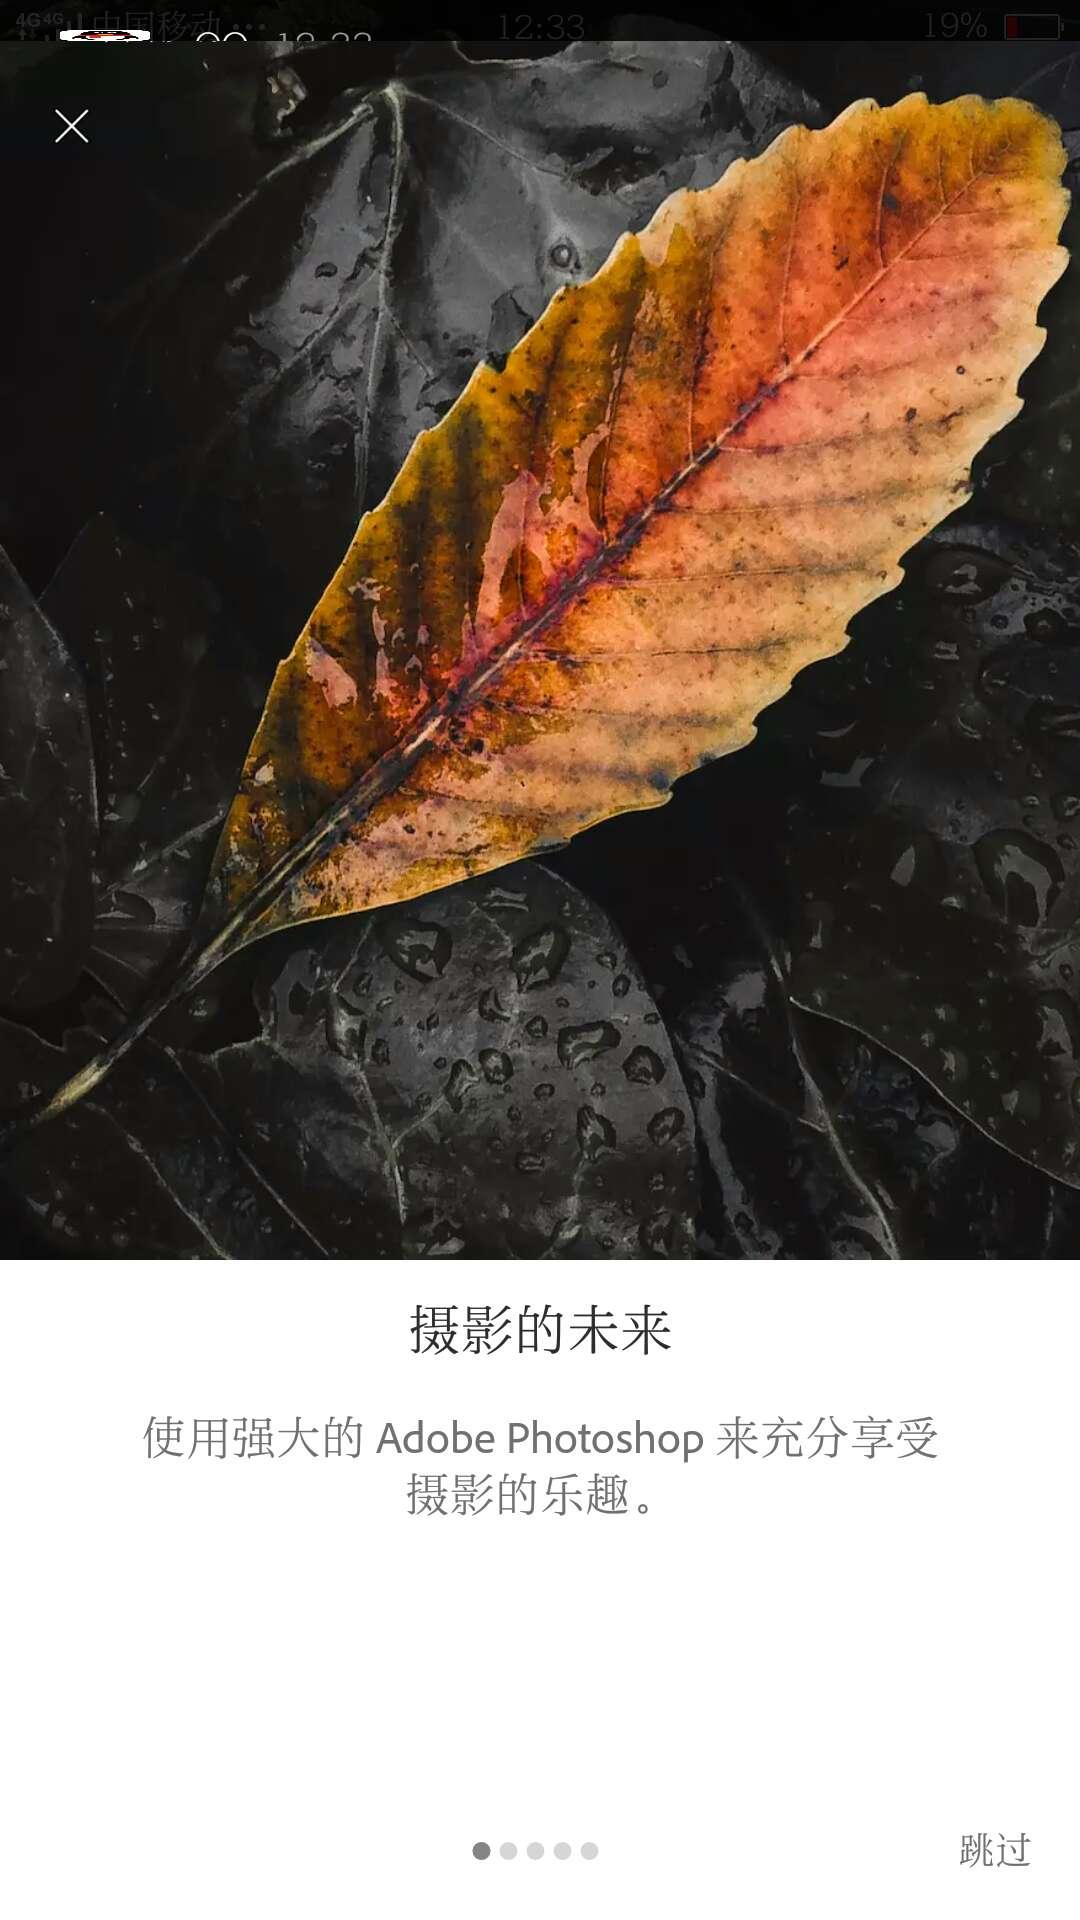 Lightroom手机中文版 v4.3 安卓破解版-七豆资源-免费分享建站精品资源教程